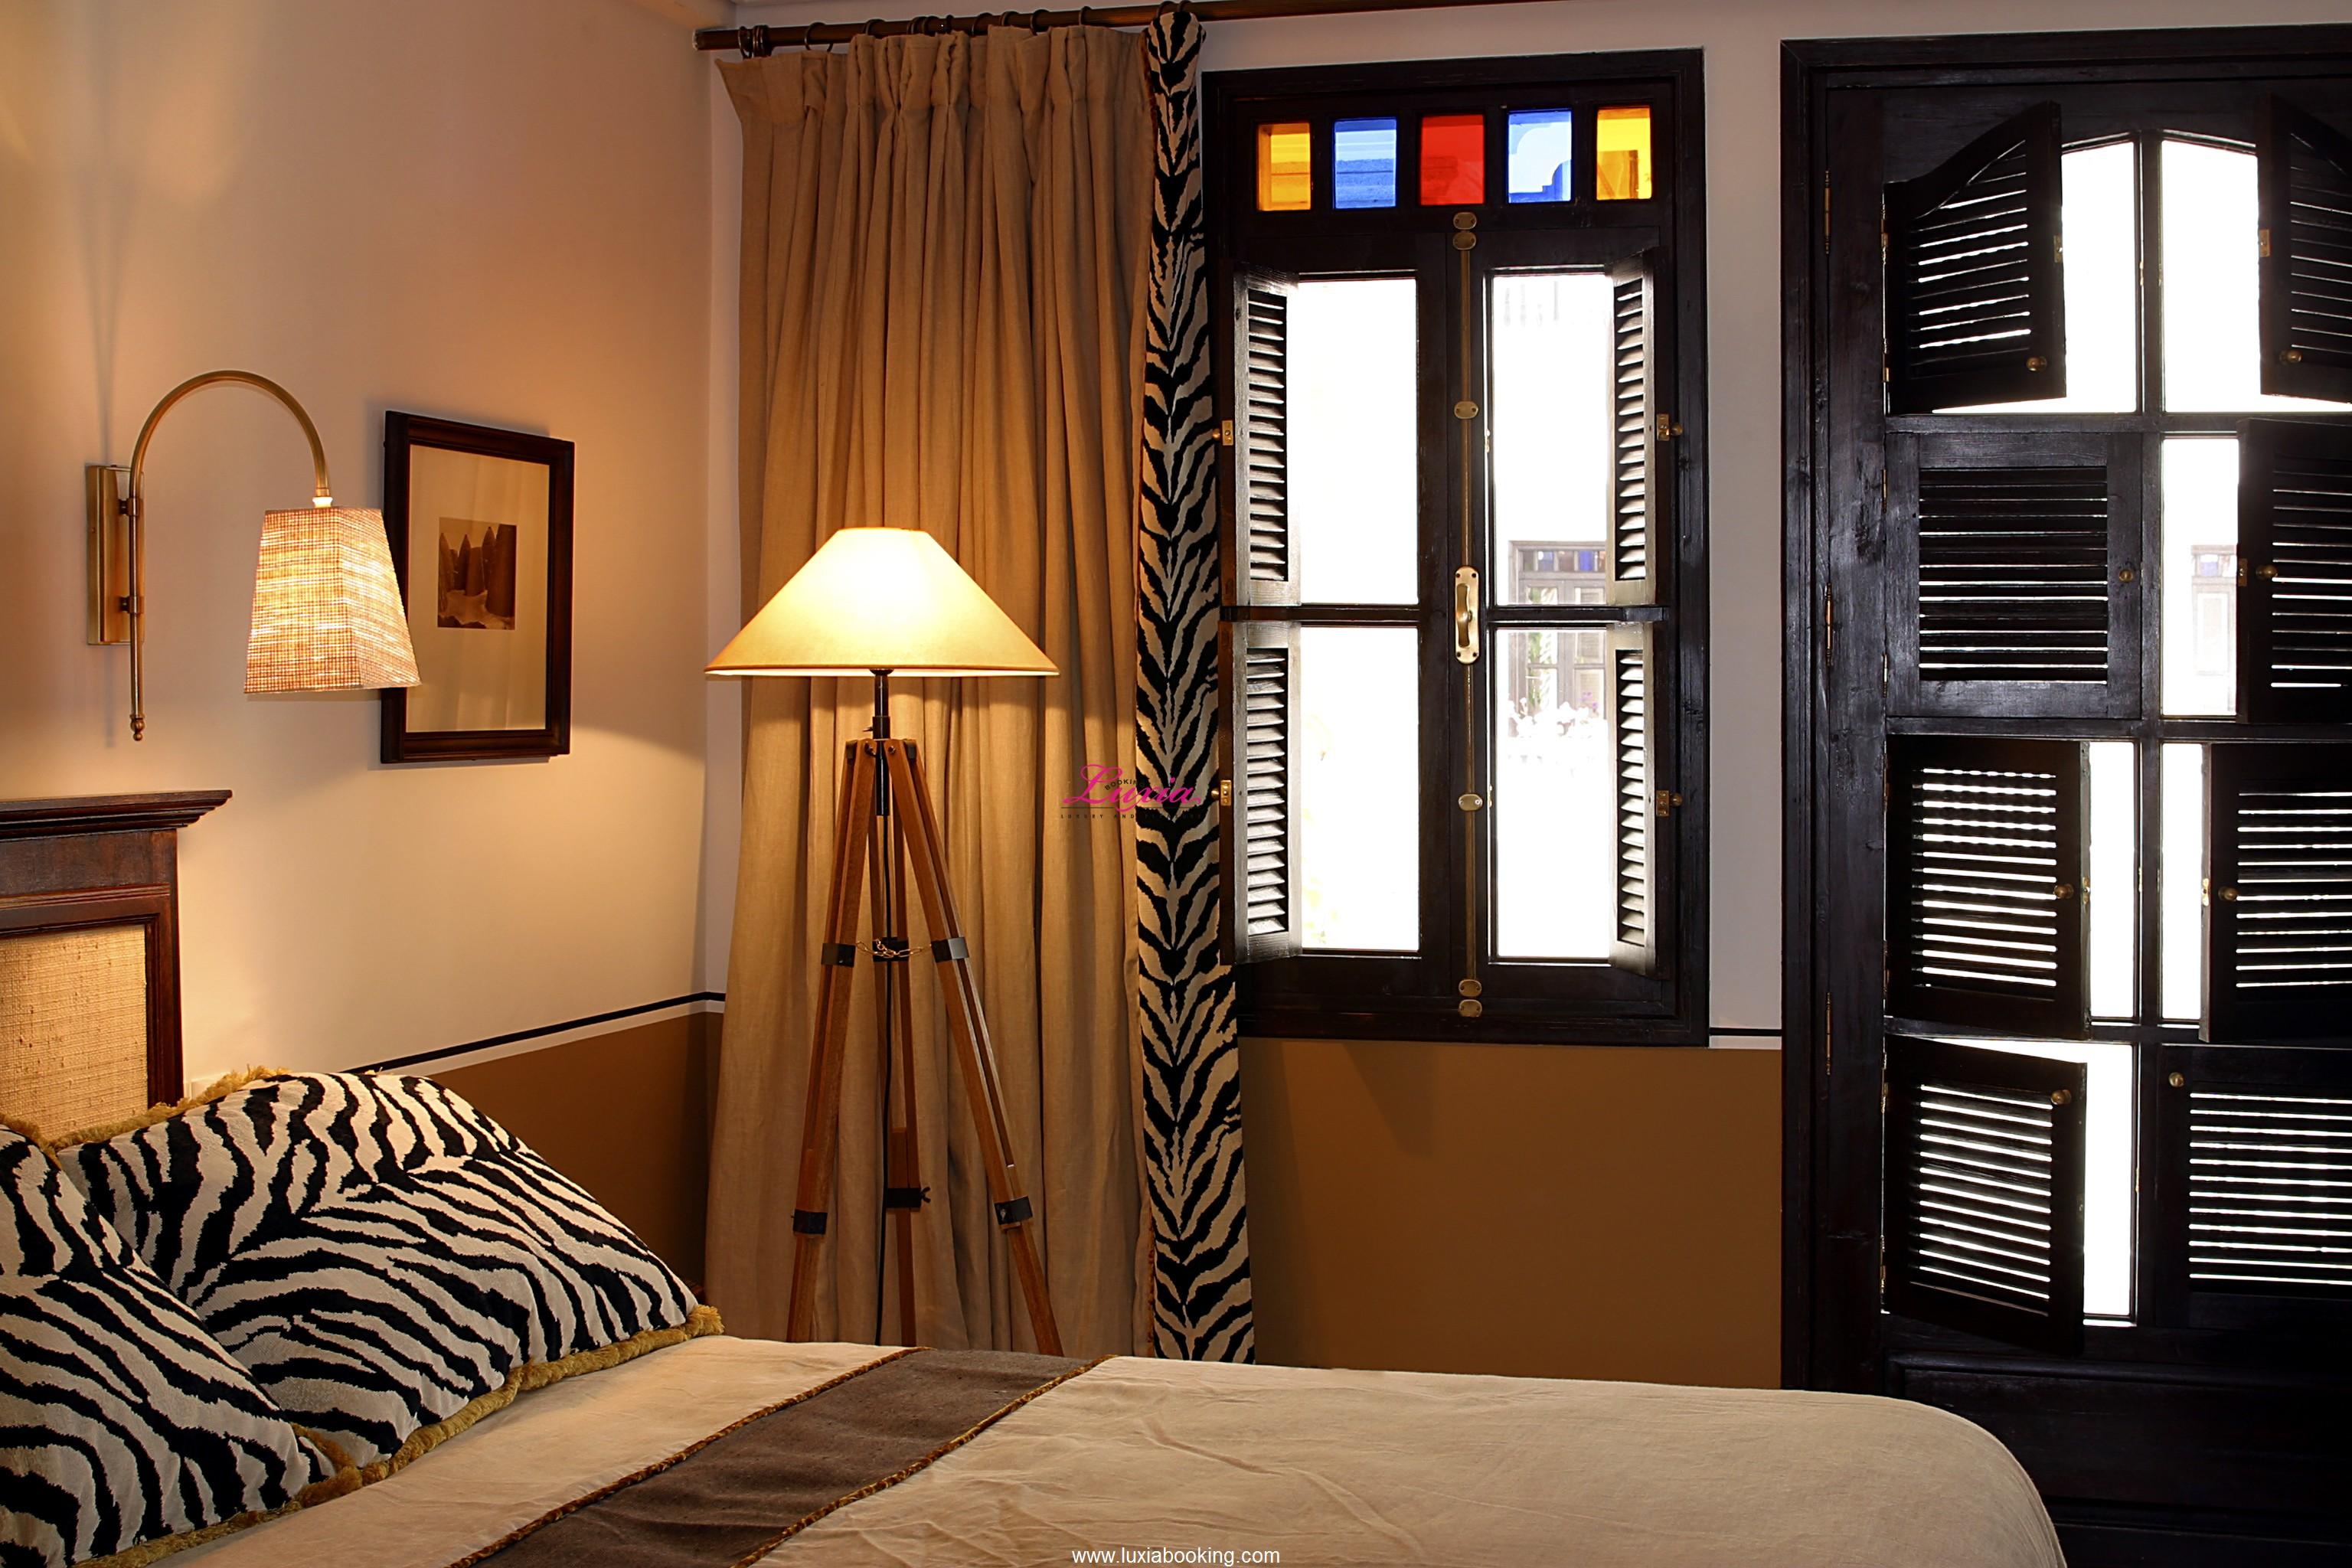 Palais heure bleue essaouira - Chambre style africain ...